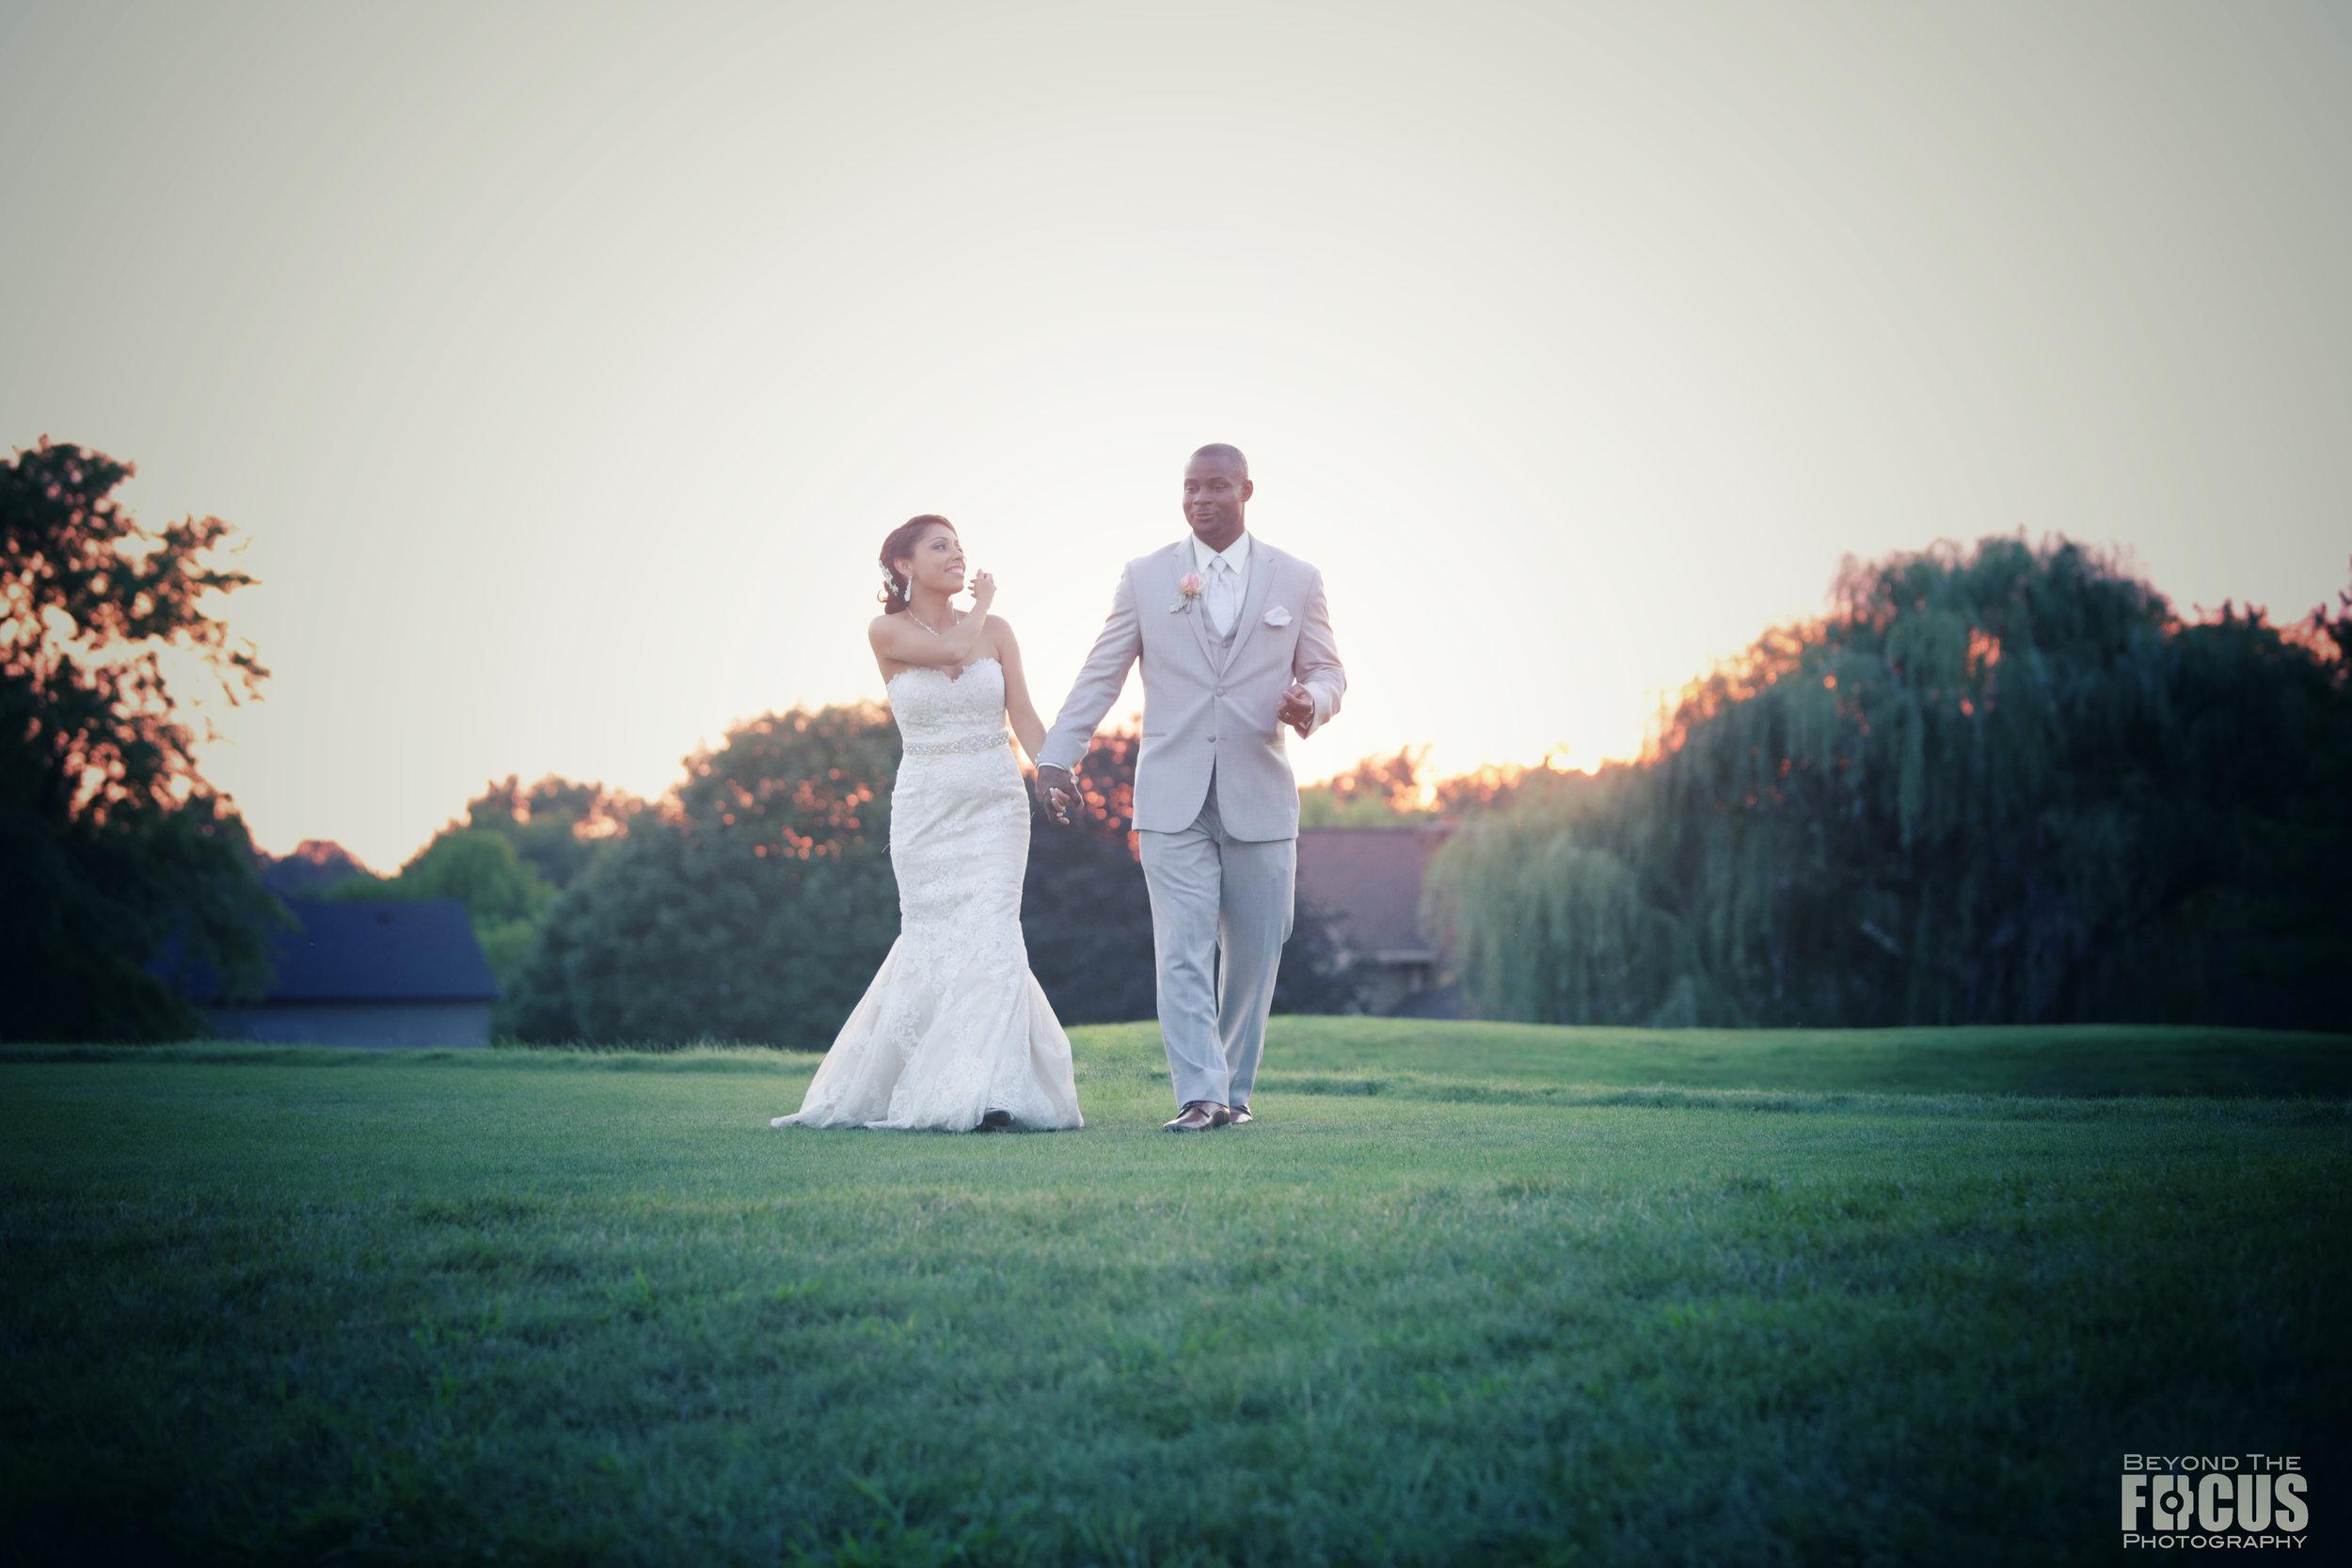 Palmer Wedding - Bride& Groom Post Wedding 12.jpg